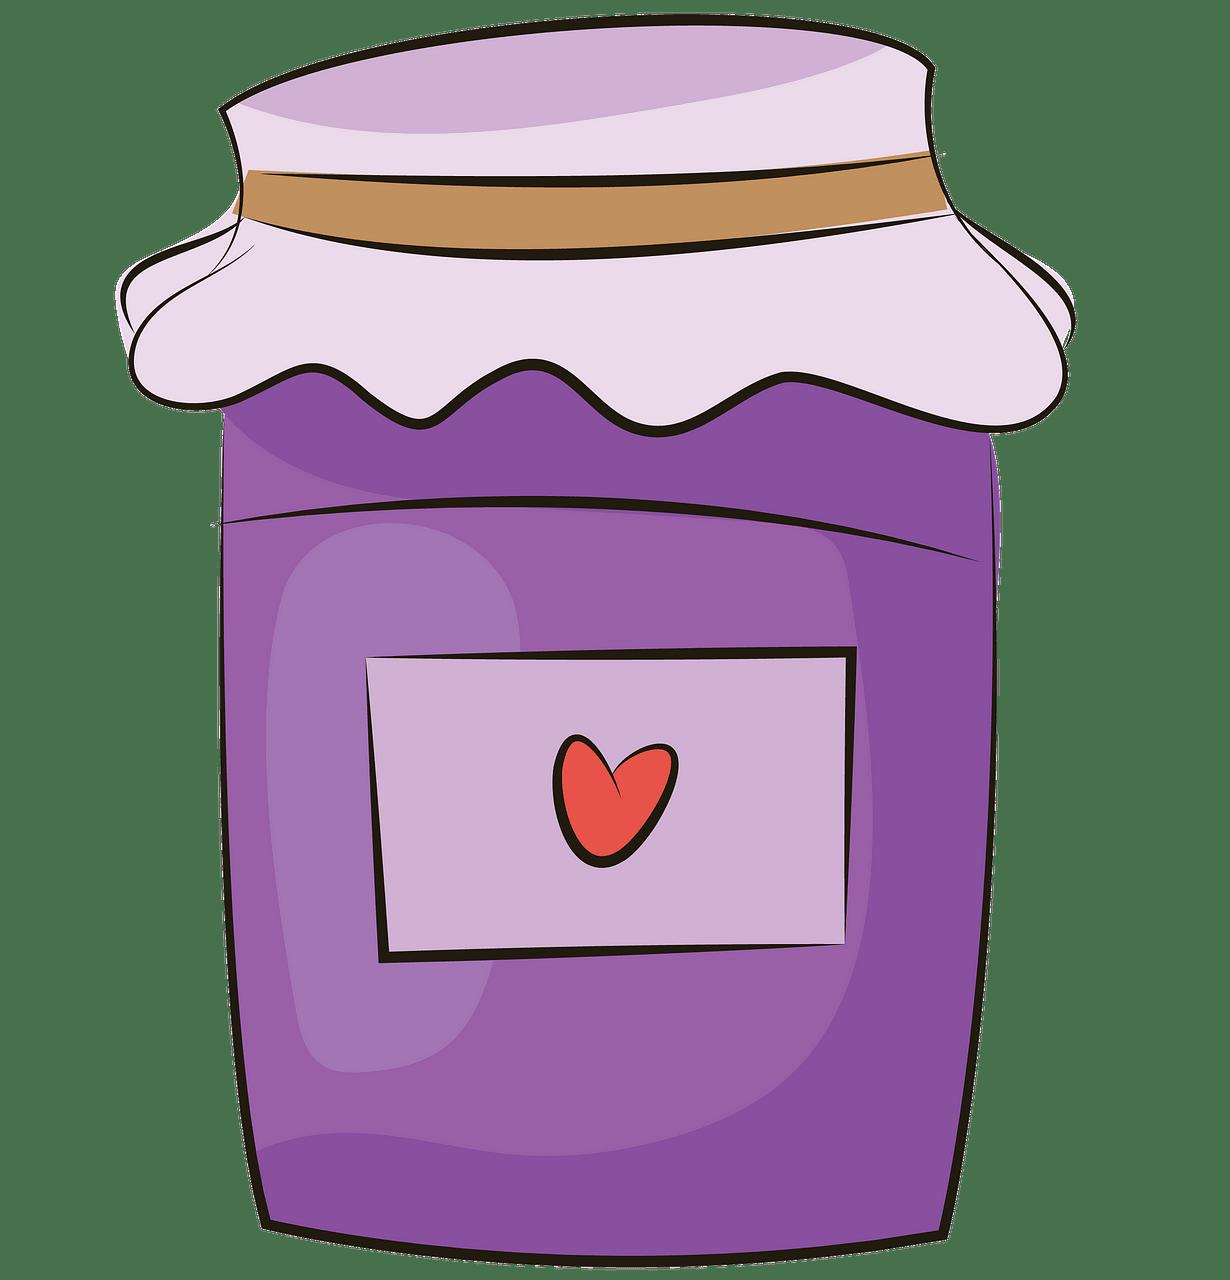 Jam jar clipart. Free download..